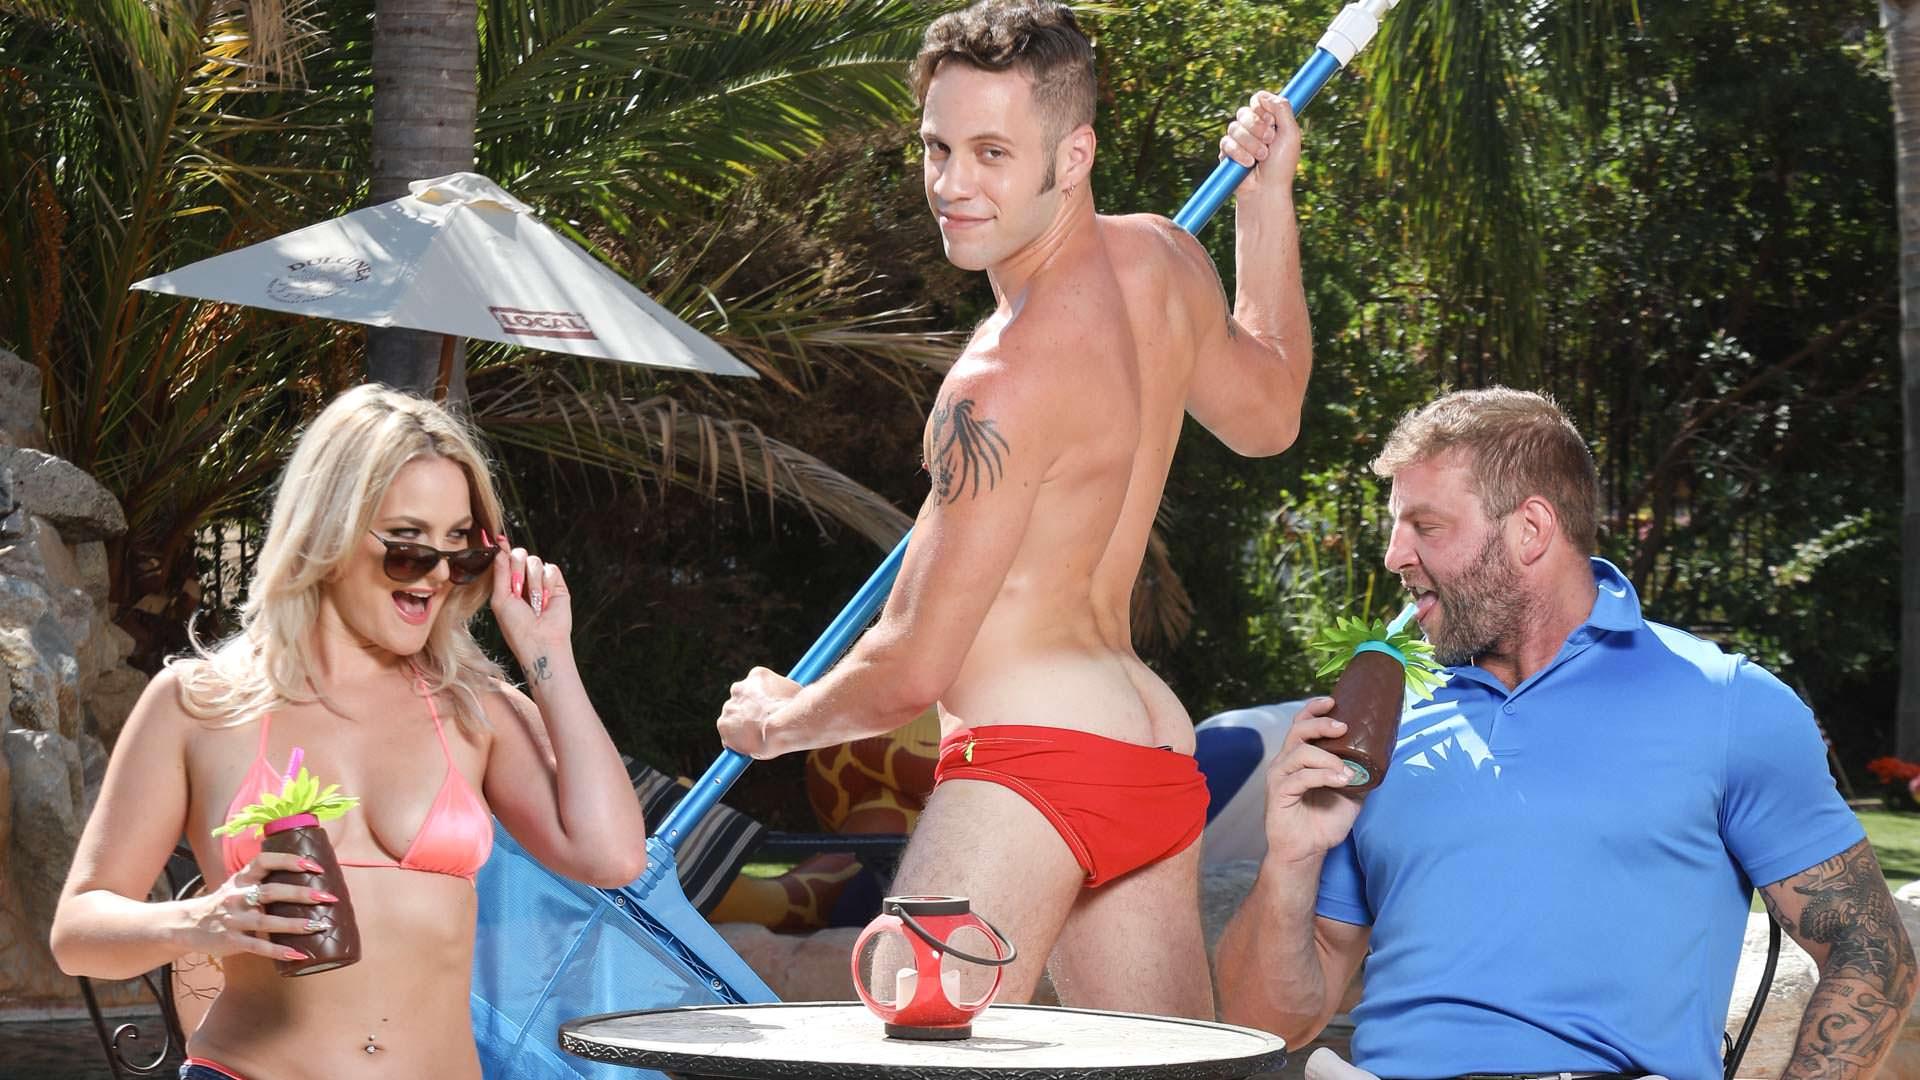 Pool Boys - Colby Jansen & Wolf Hudson & Lisey Sweet 1